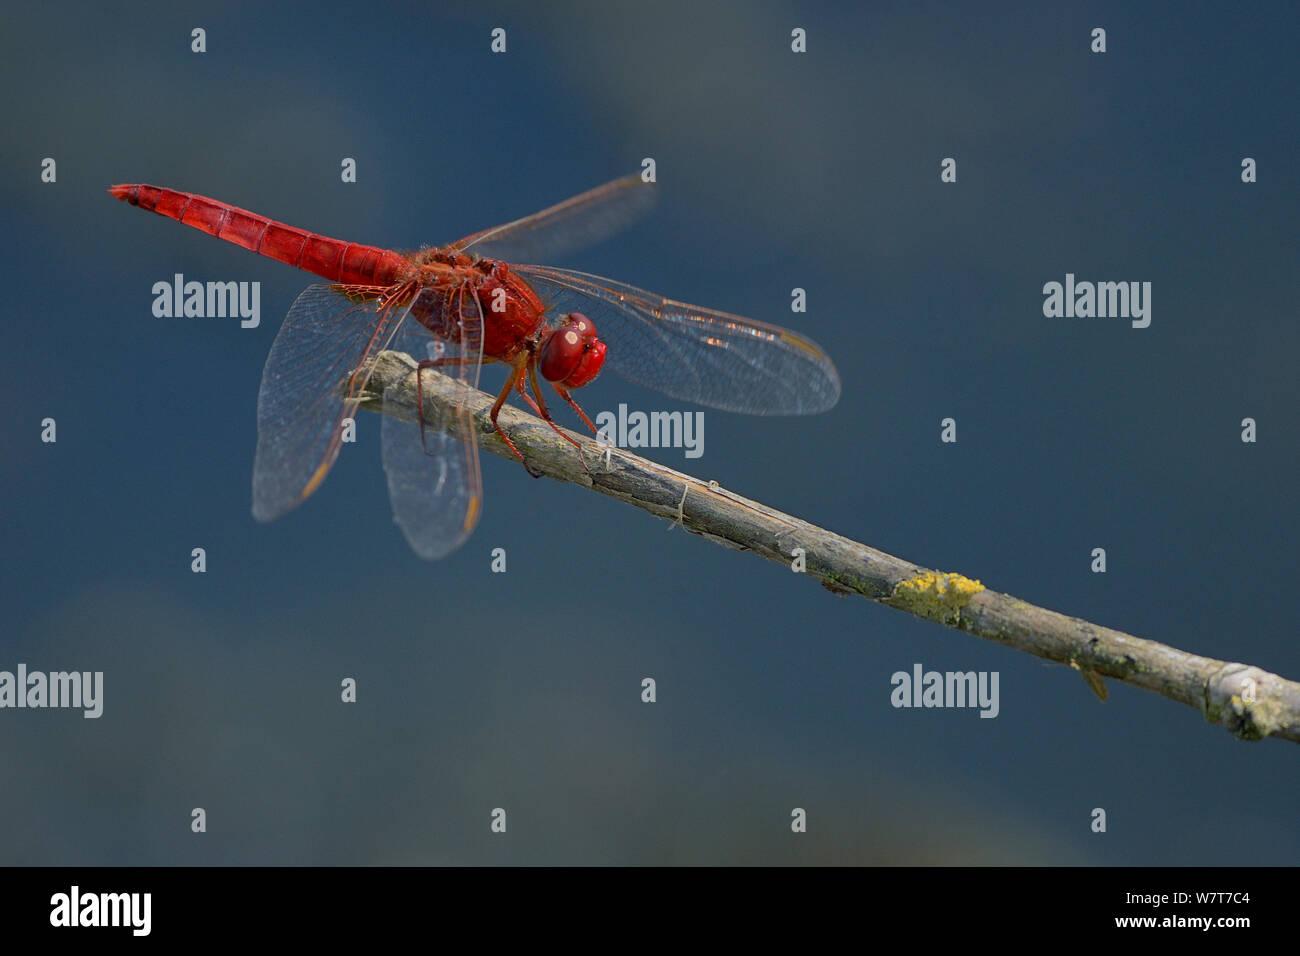 Male Scarlet dragonfly (Crocothemis erythraea) resting on a twig, Marais breton, Brittany / Bretagne, France, July. Stock Photo